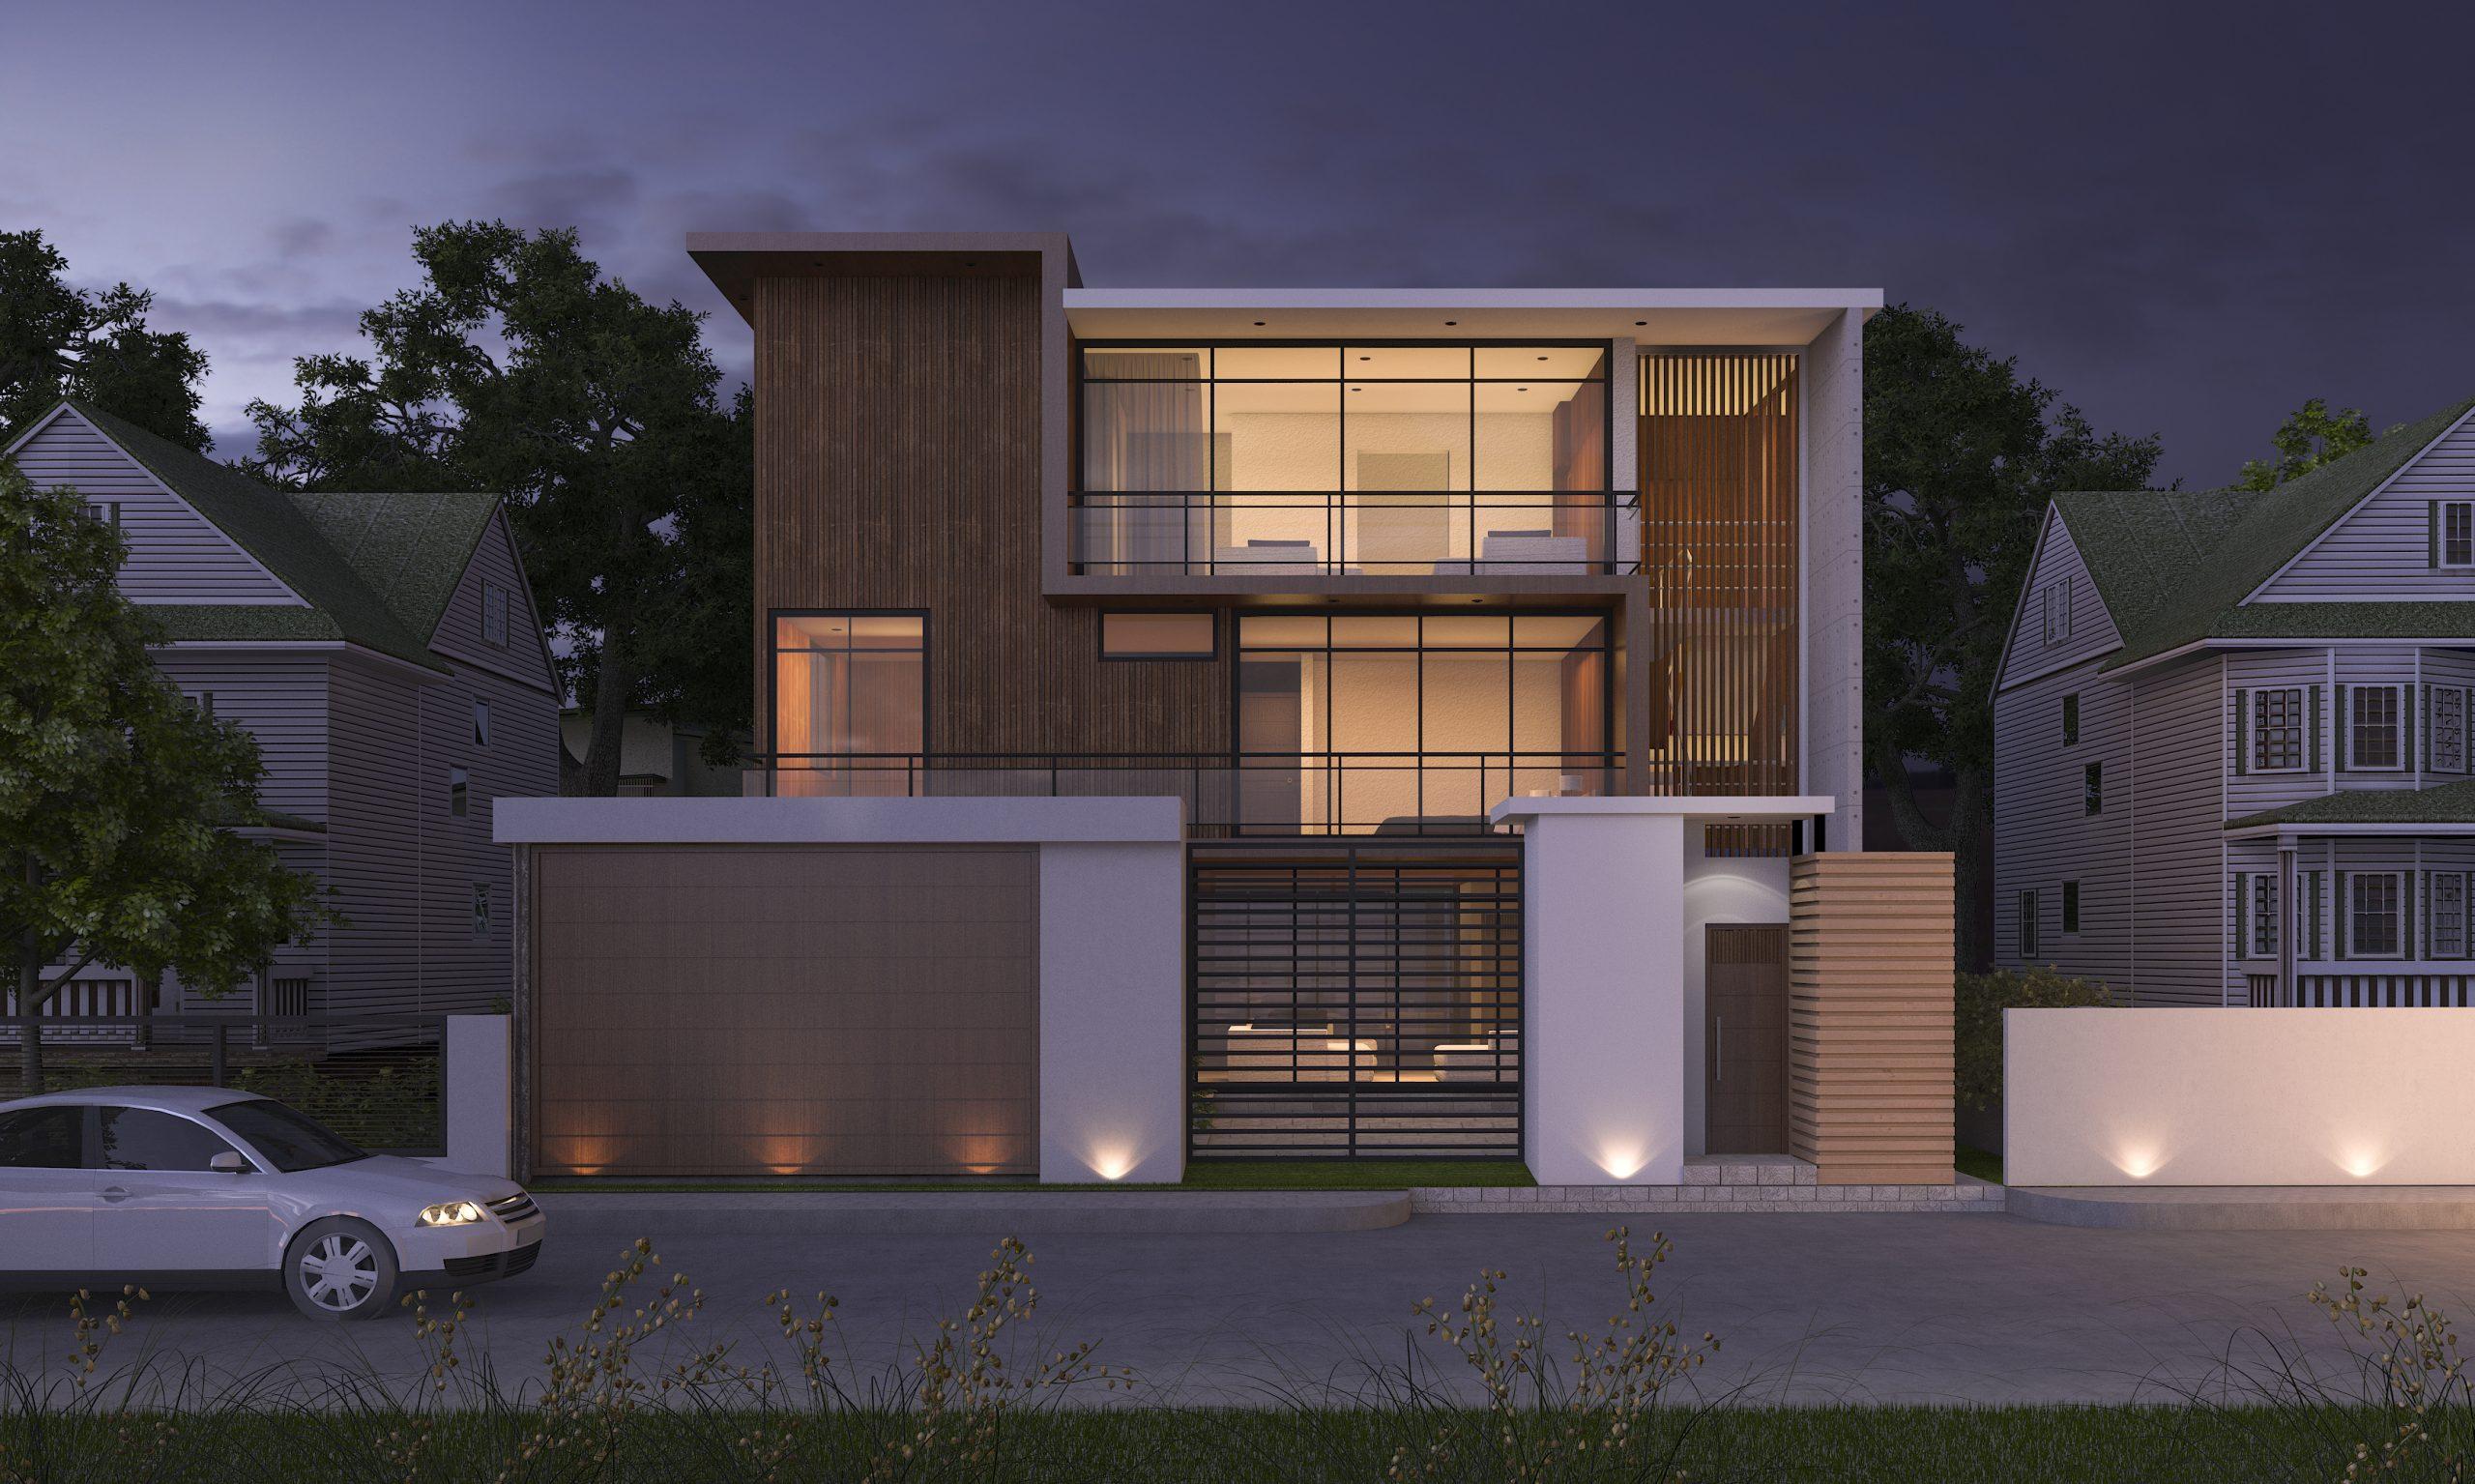 3d-rendering-luxury-modern-design-wood-building-near-park-nature-night-scene